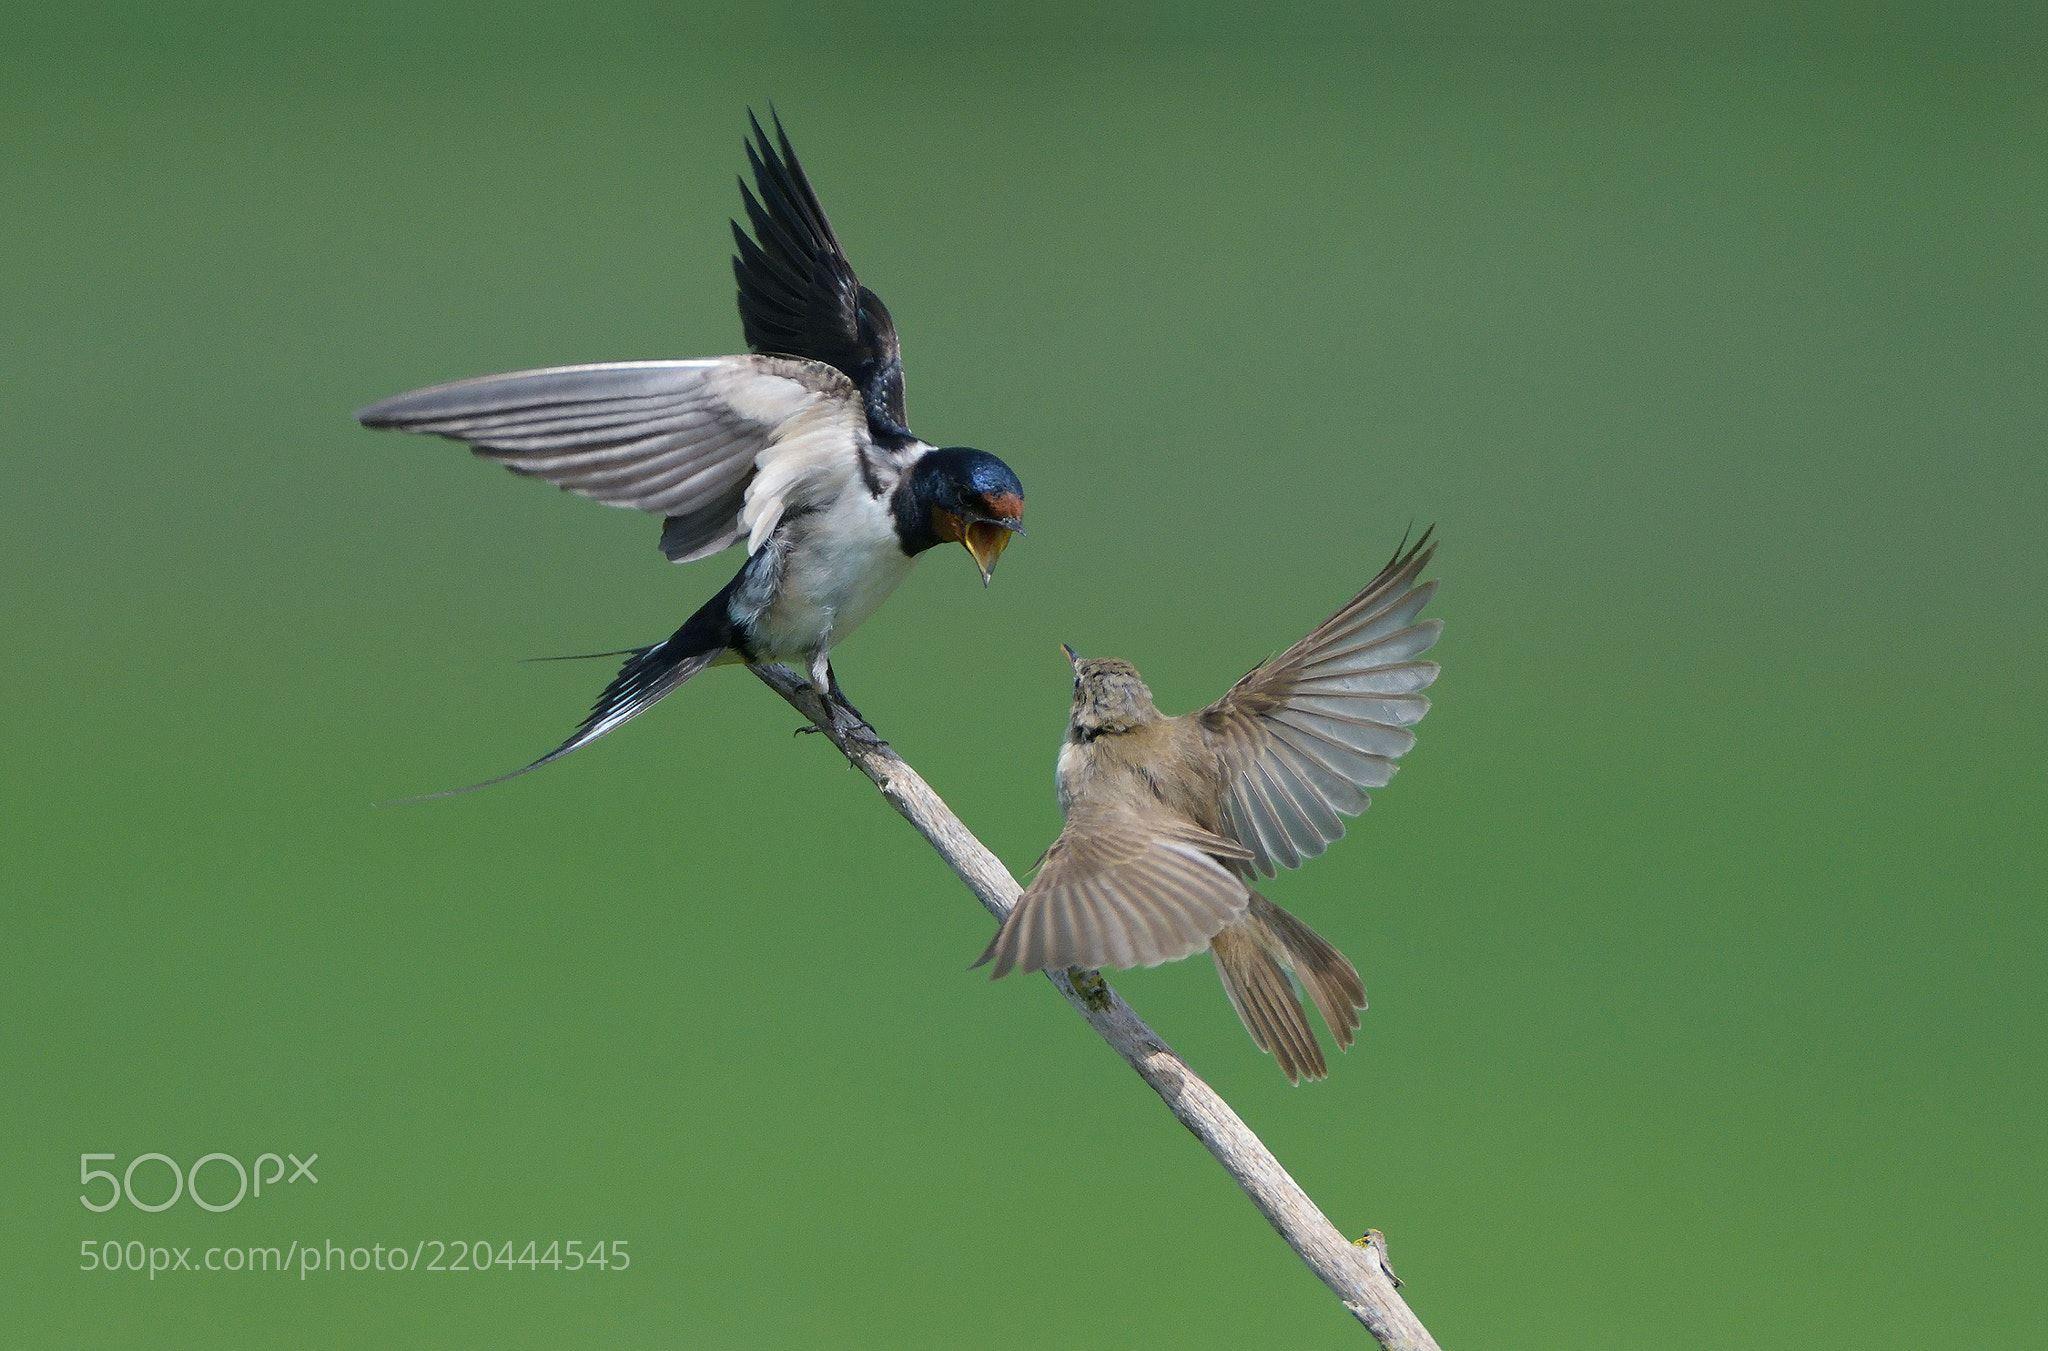 Bugger Off !! (Harry  Eggens / Groningen / Netherlands) #NIKON D500 #animals #photo #nature